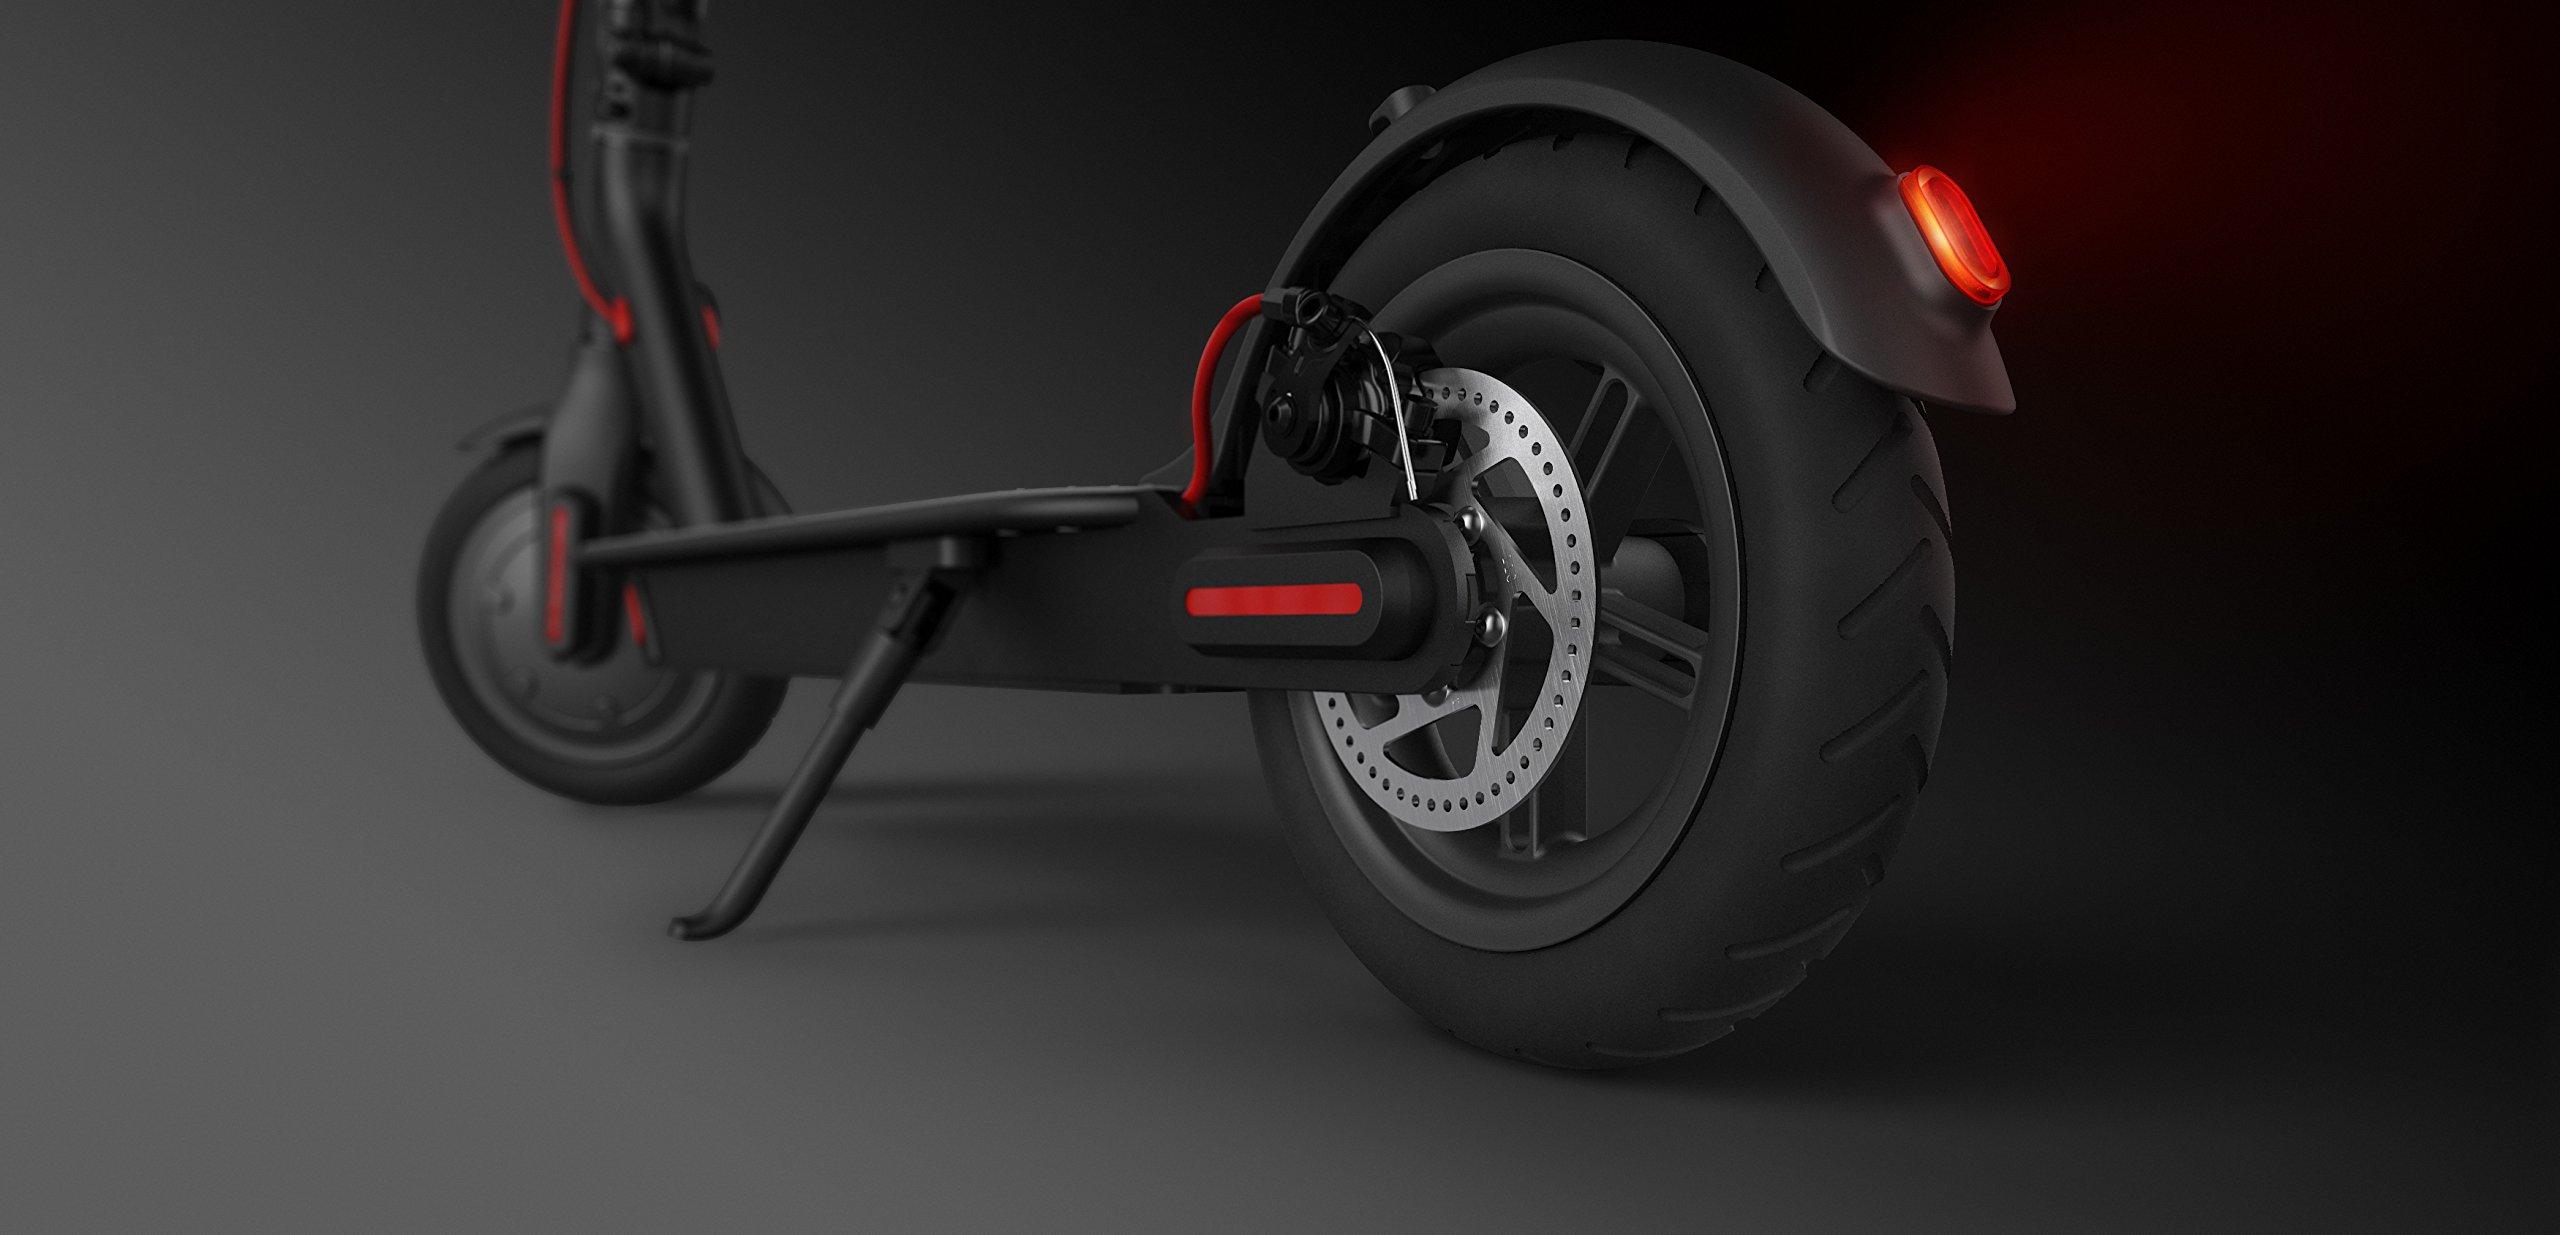 Comprar Xiaomi Mi Scooter M365 - Patinete eléctrico plegable, 30 Km alcance, 25km/h, negro